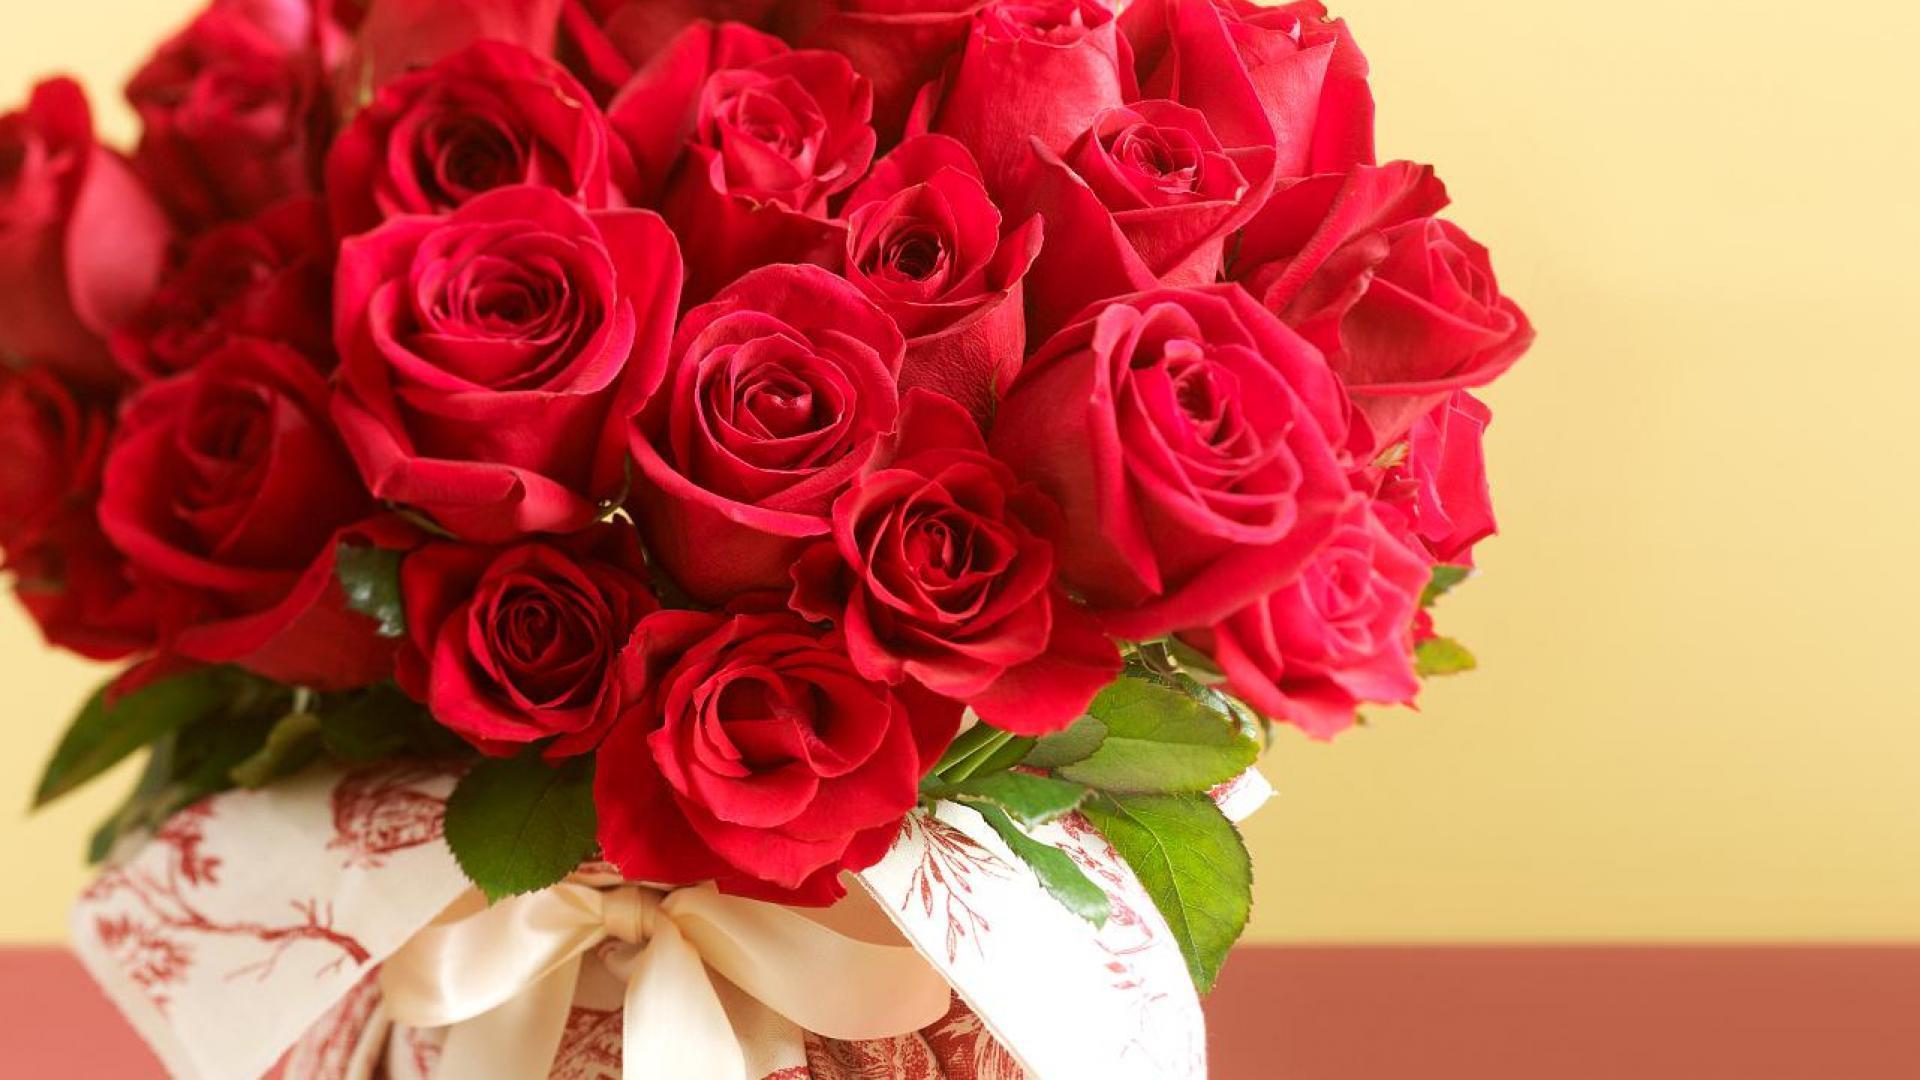 red roses wallpapers for desktop wallpaper cave